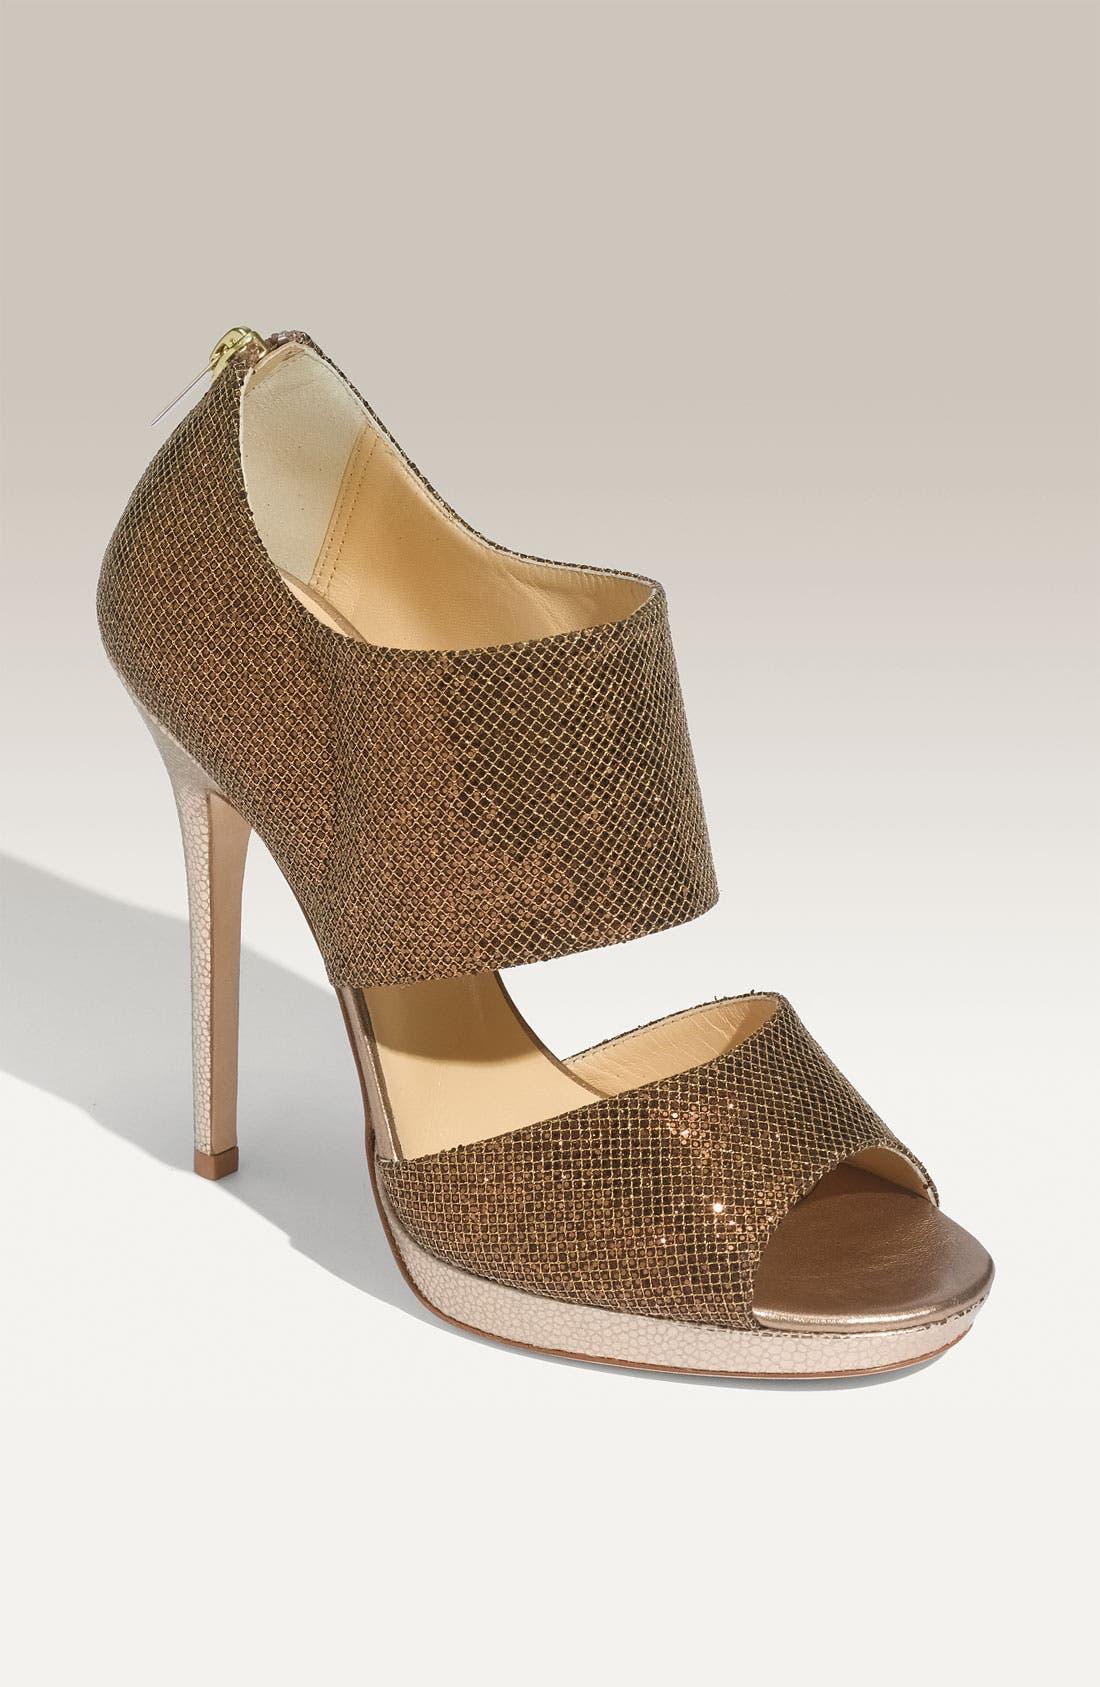 Main Image - Jimmy Choo 'Private' Cuff Glitter Fabric Sandal